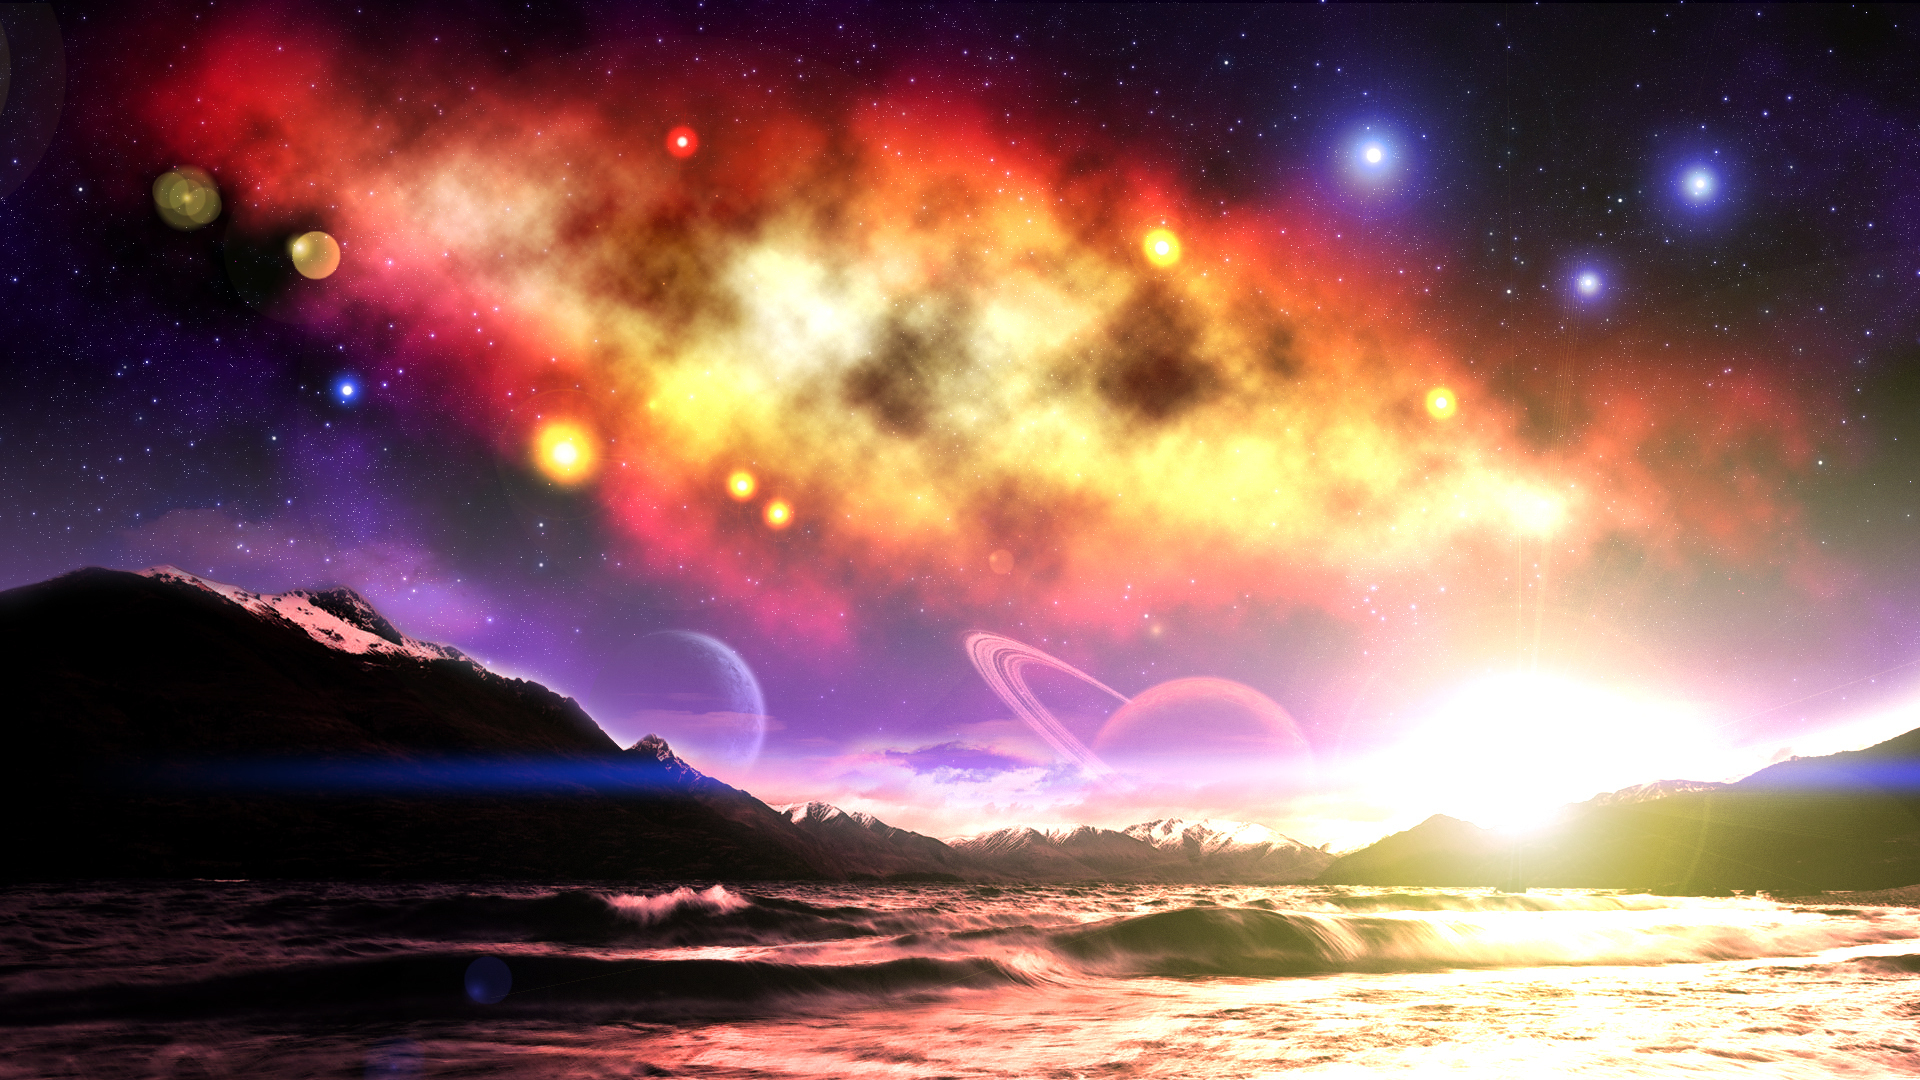 Nebula Planet Space Stars Sunrise 1920x1080